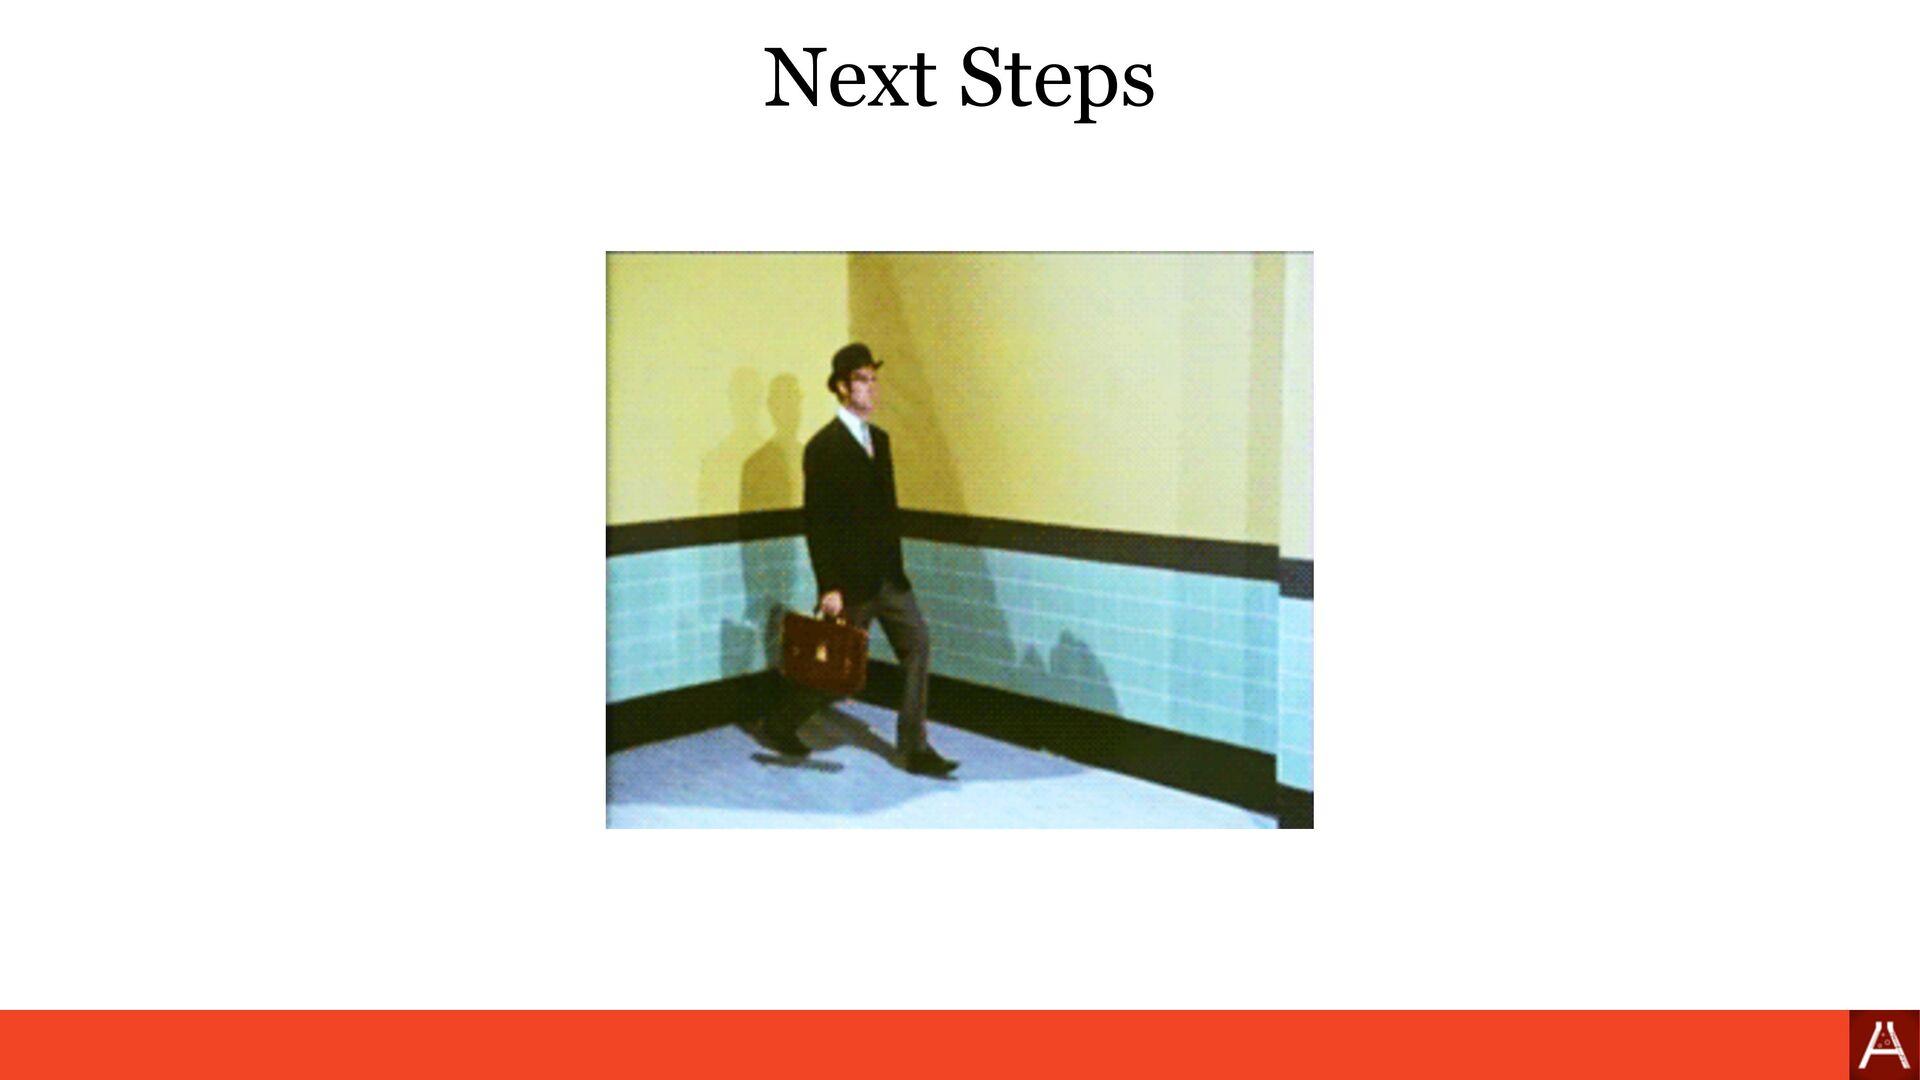 Tools https://www.alchemists.io/projects